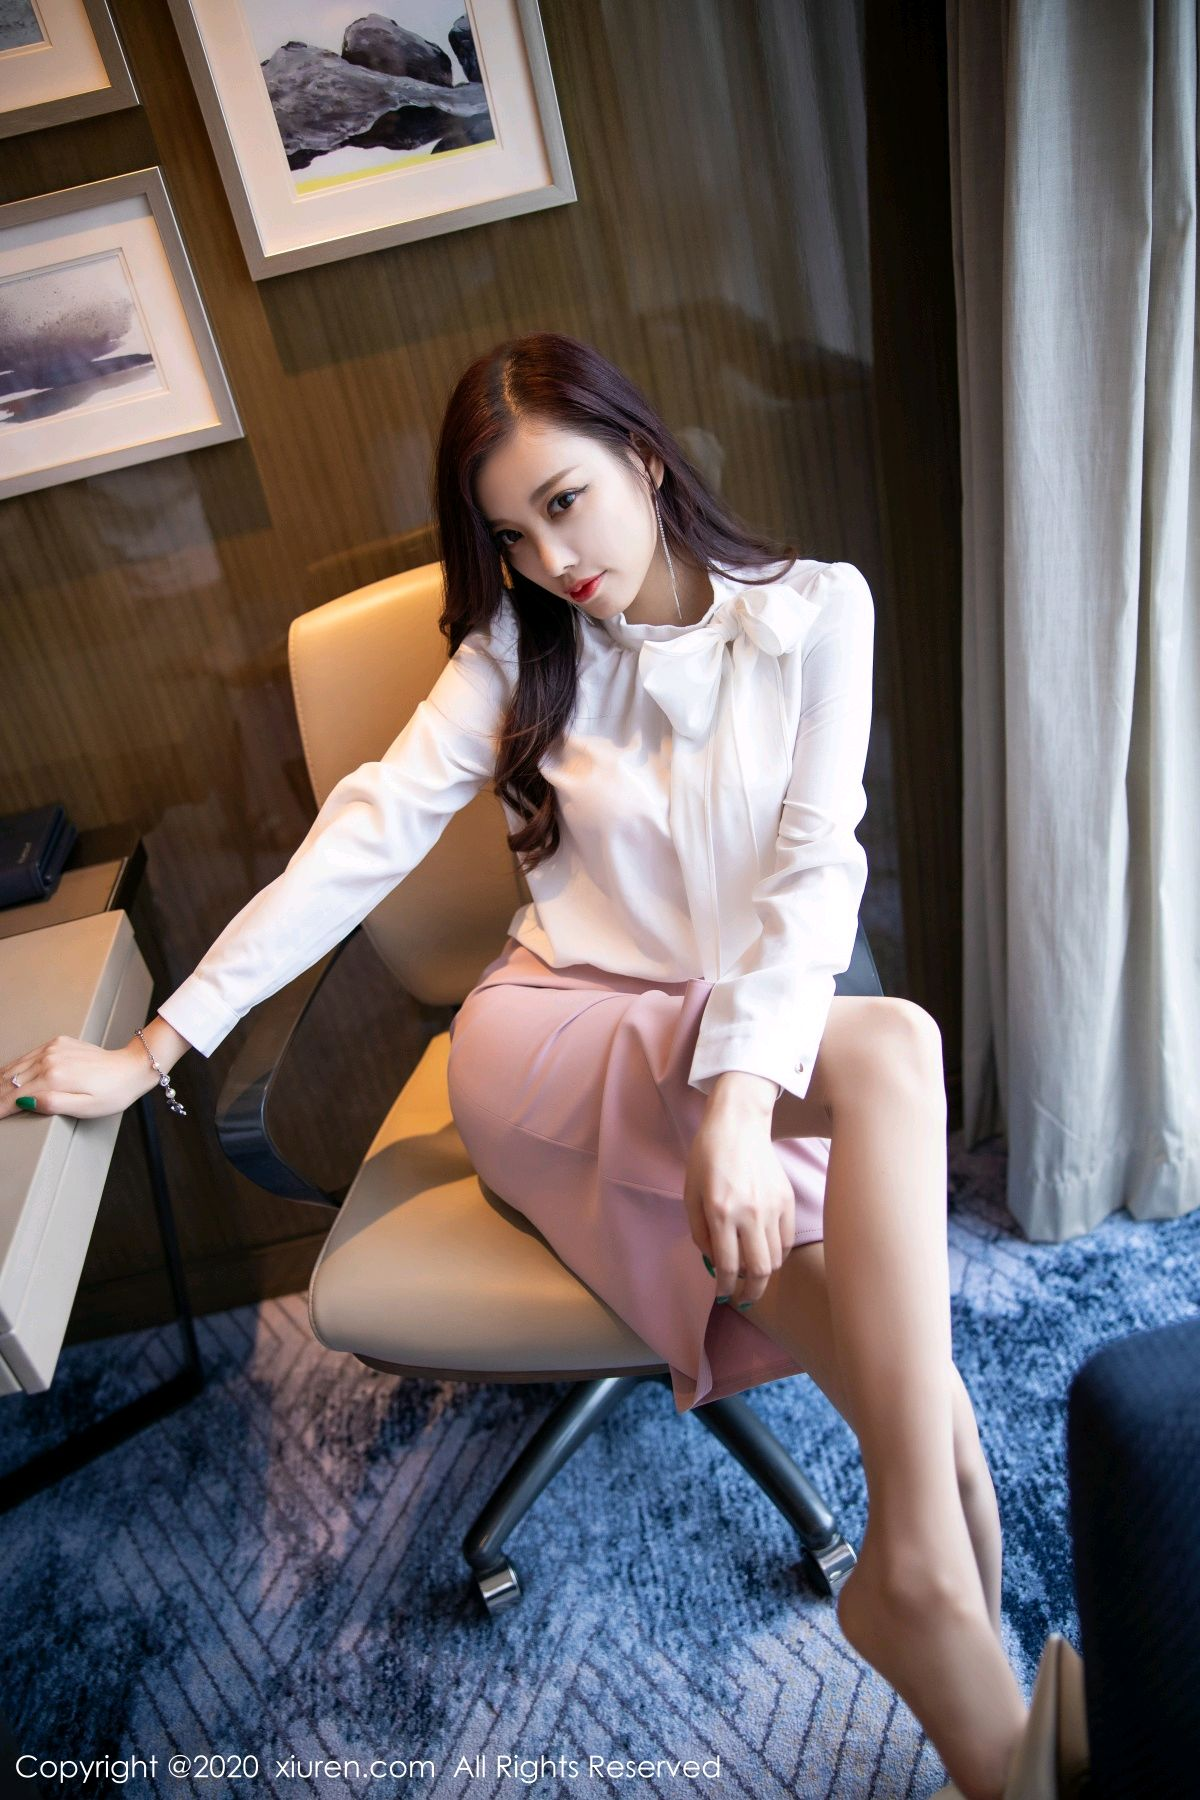 [XiuRen] Vol.2431 Yang Chen Chen 47P, Tall, Underwear, Uniform, Xiuren, Yang Chen Chen